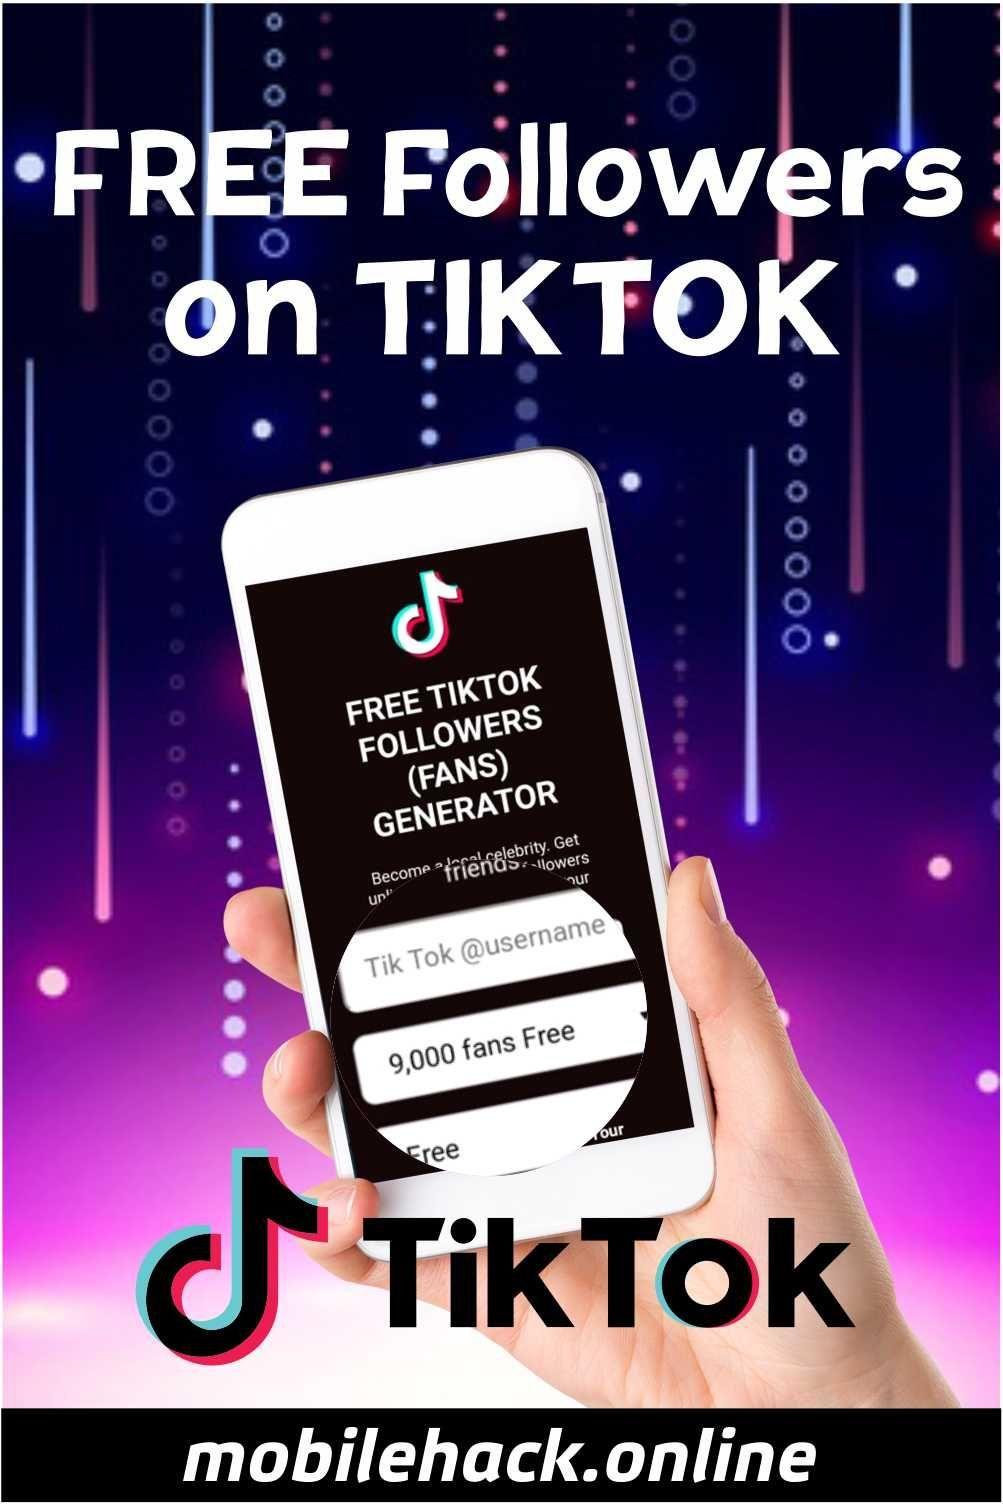 Free followers on tik tok in 2020 free followers how to